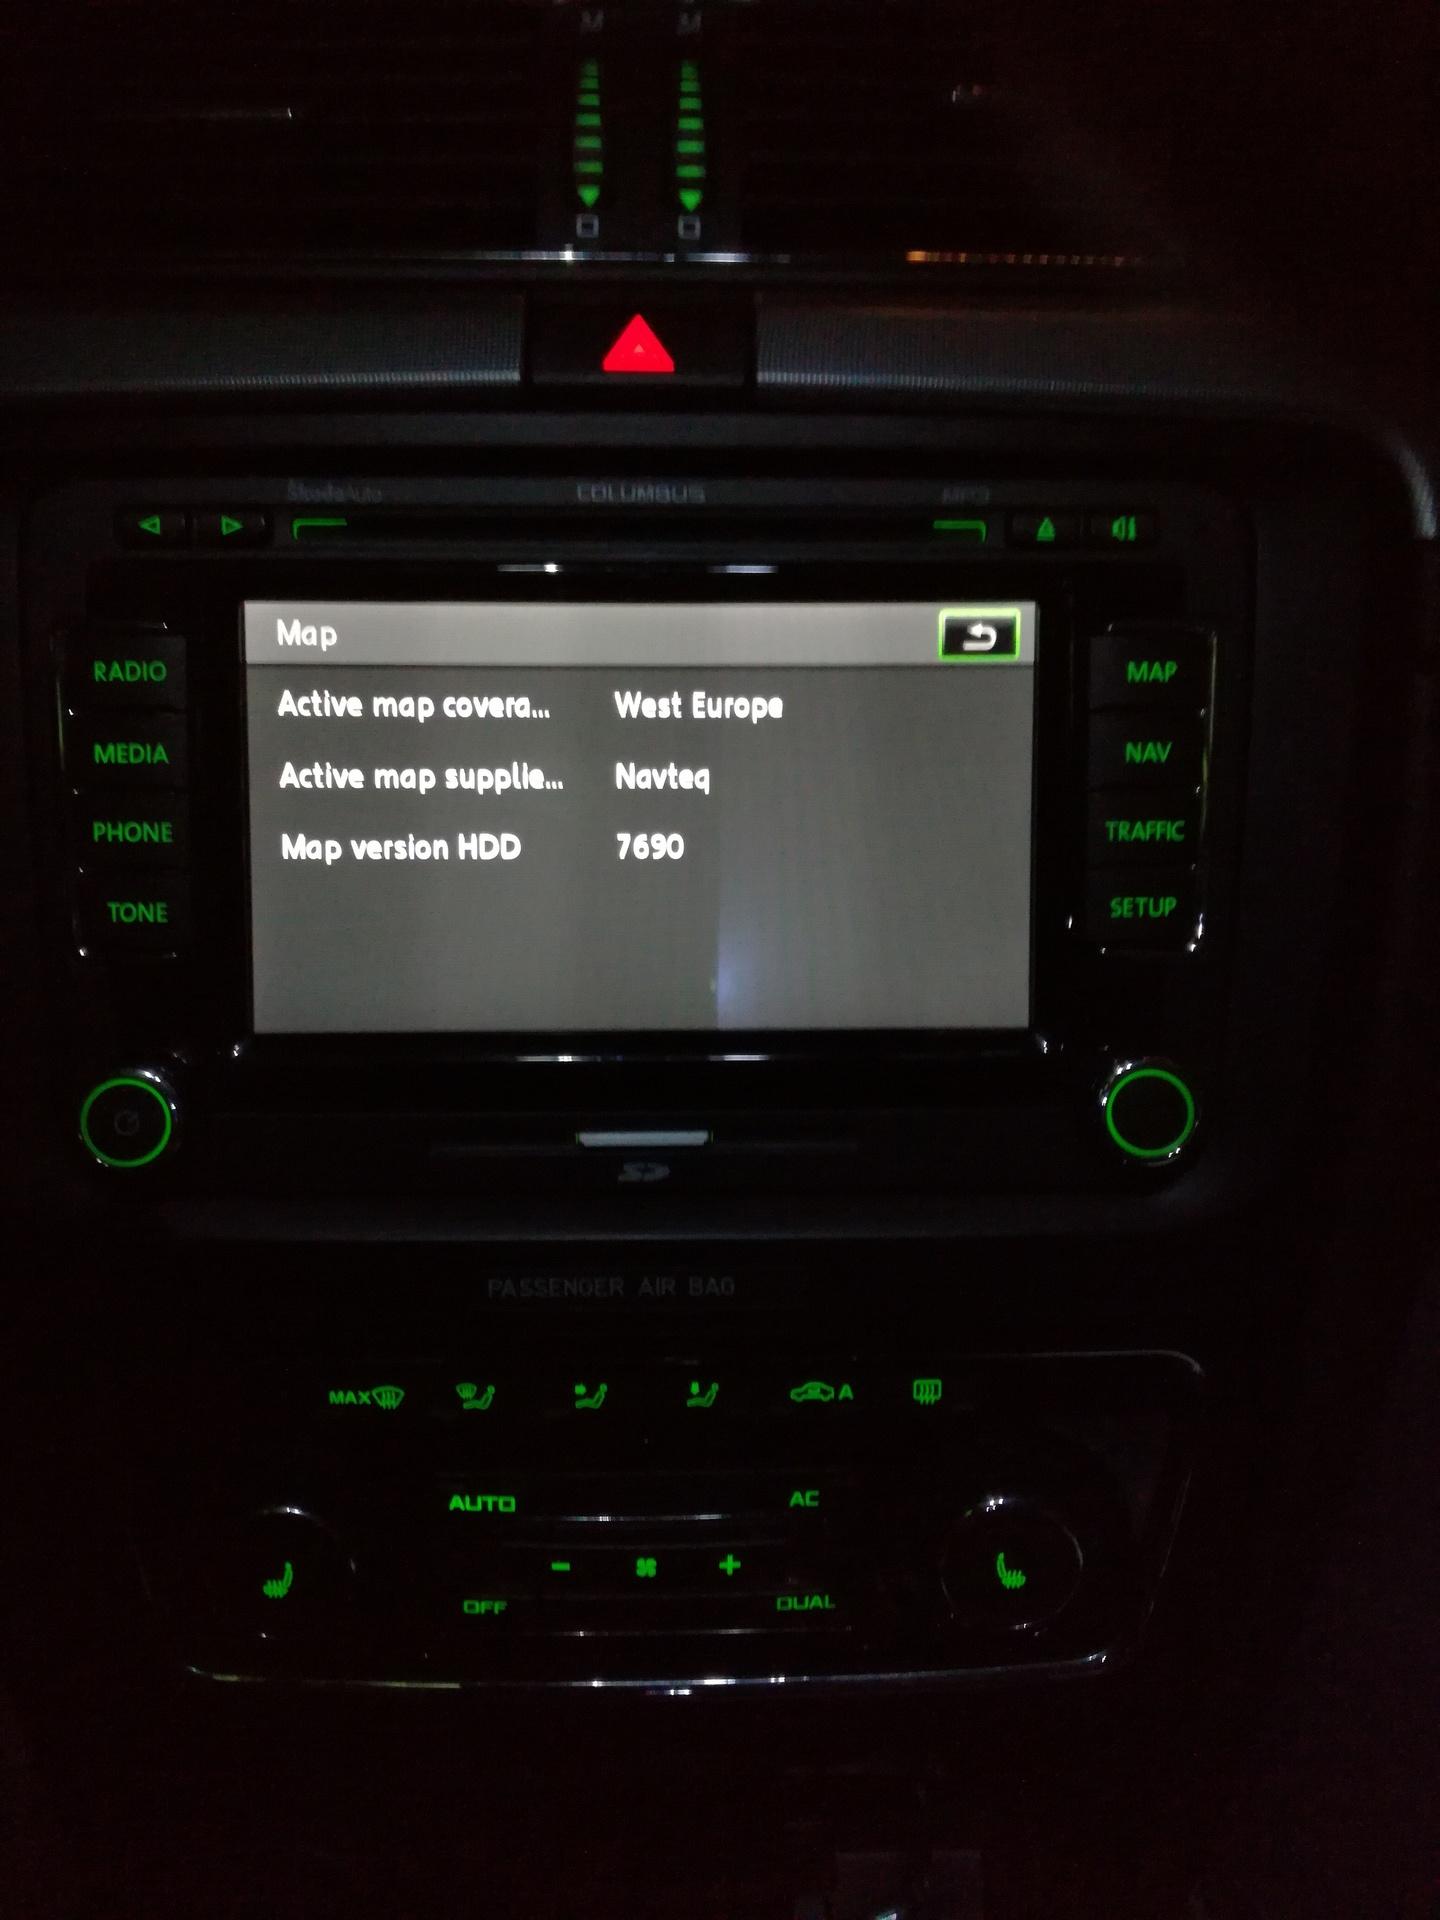 firmware hw vehicle 0xc801 sw vehicle 0x4434002f